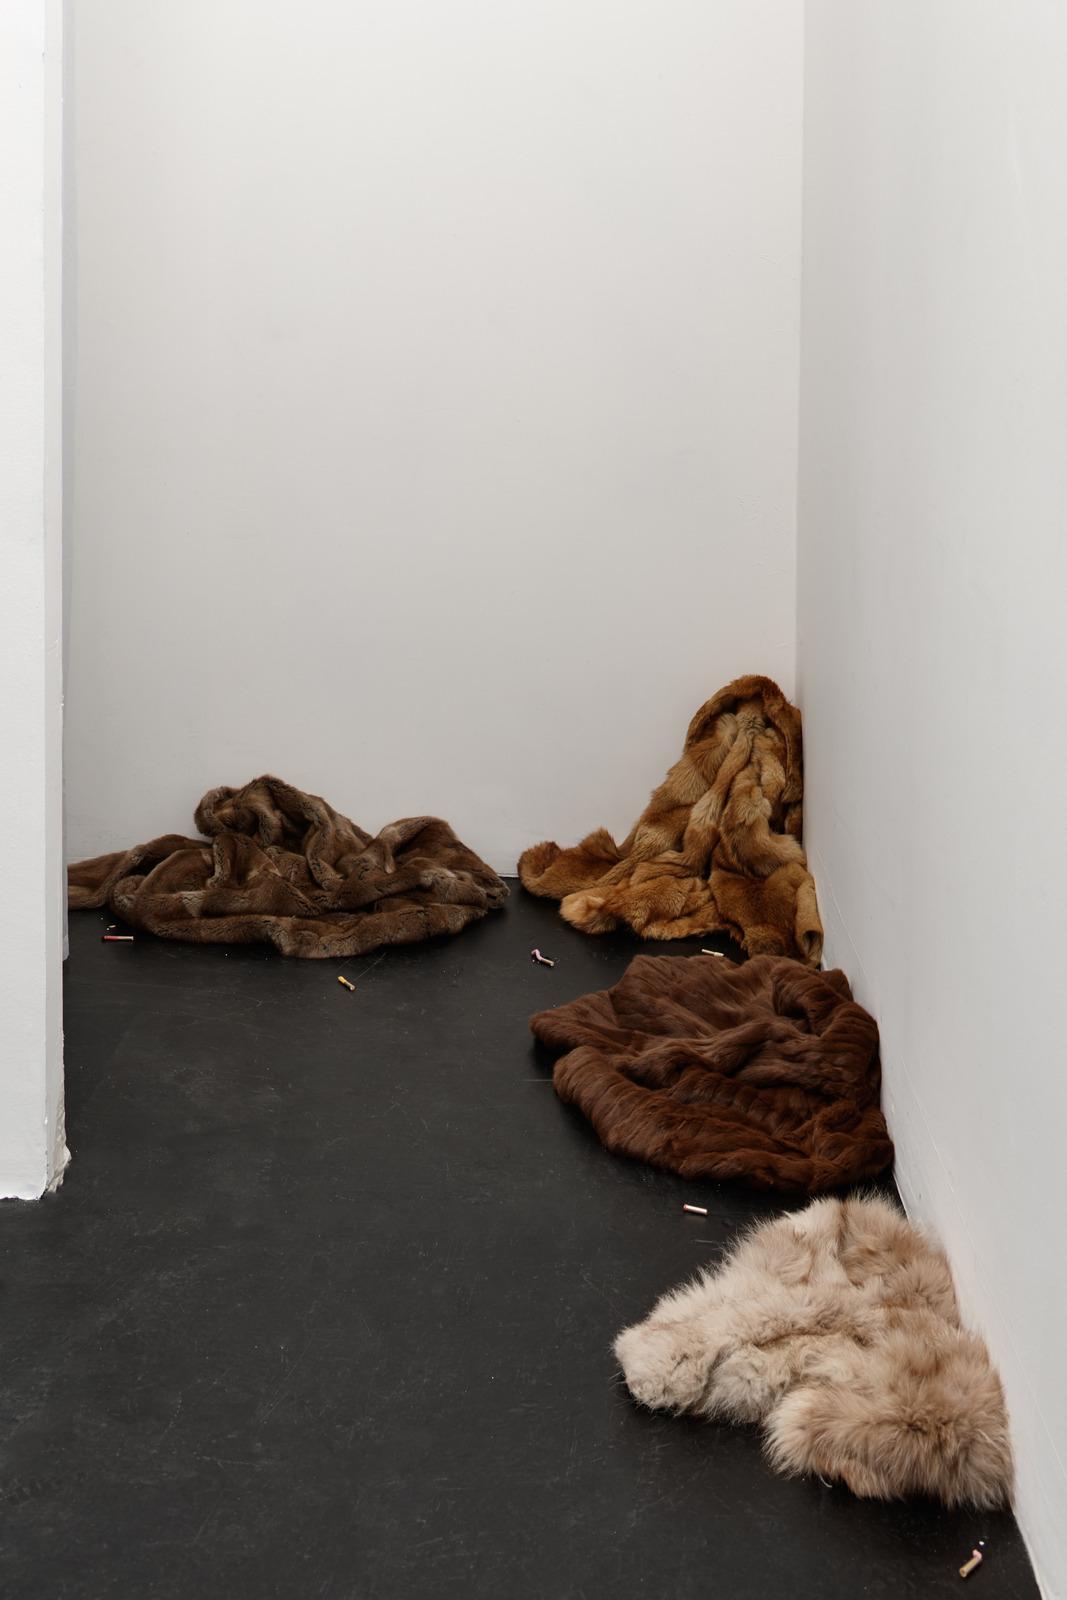 Zoe Williams - Pel remnants (Smoking in Furs), 2016